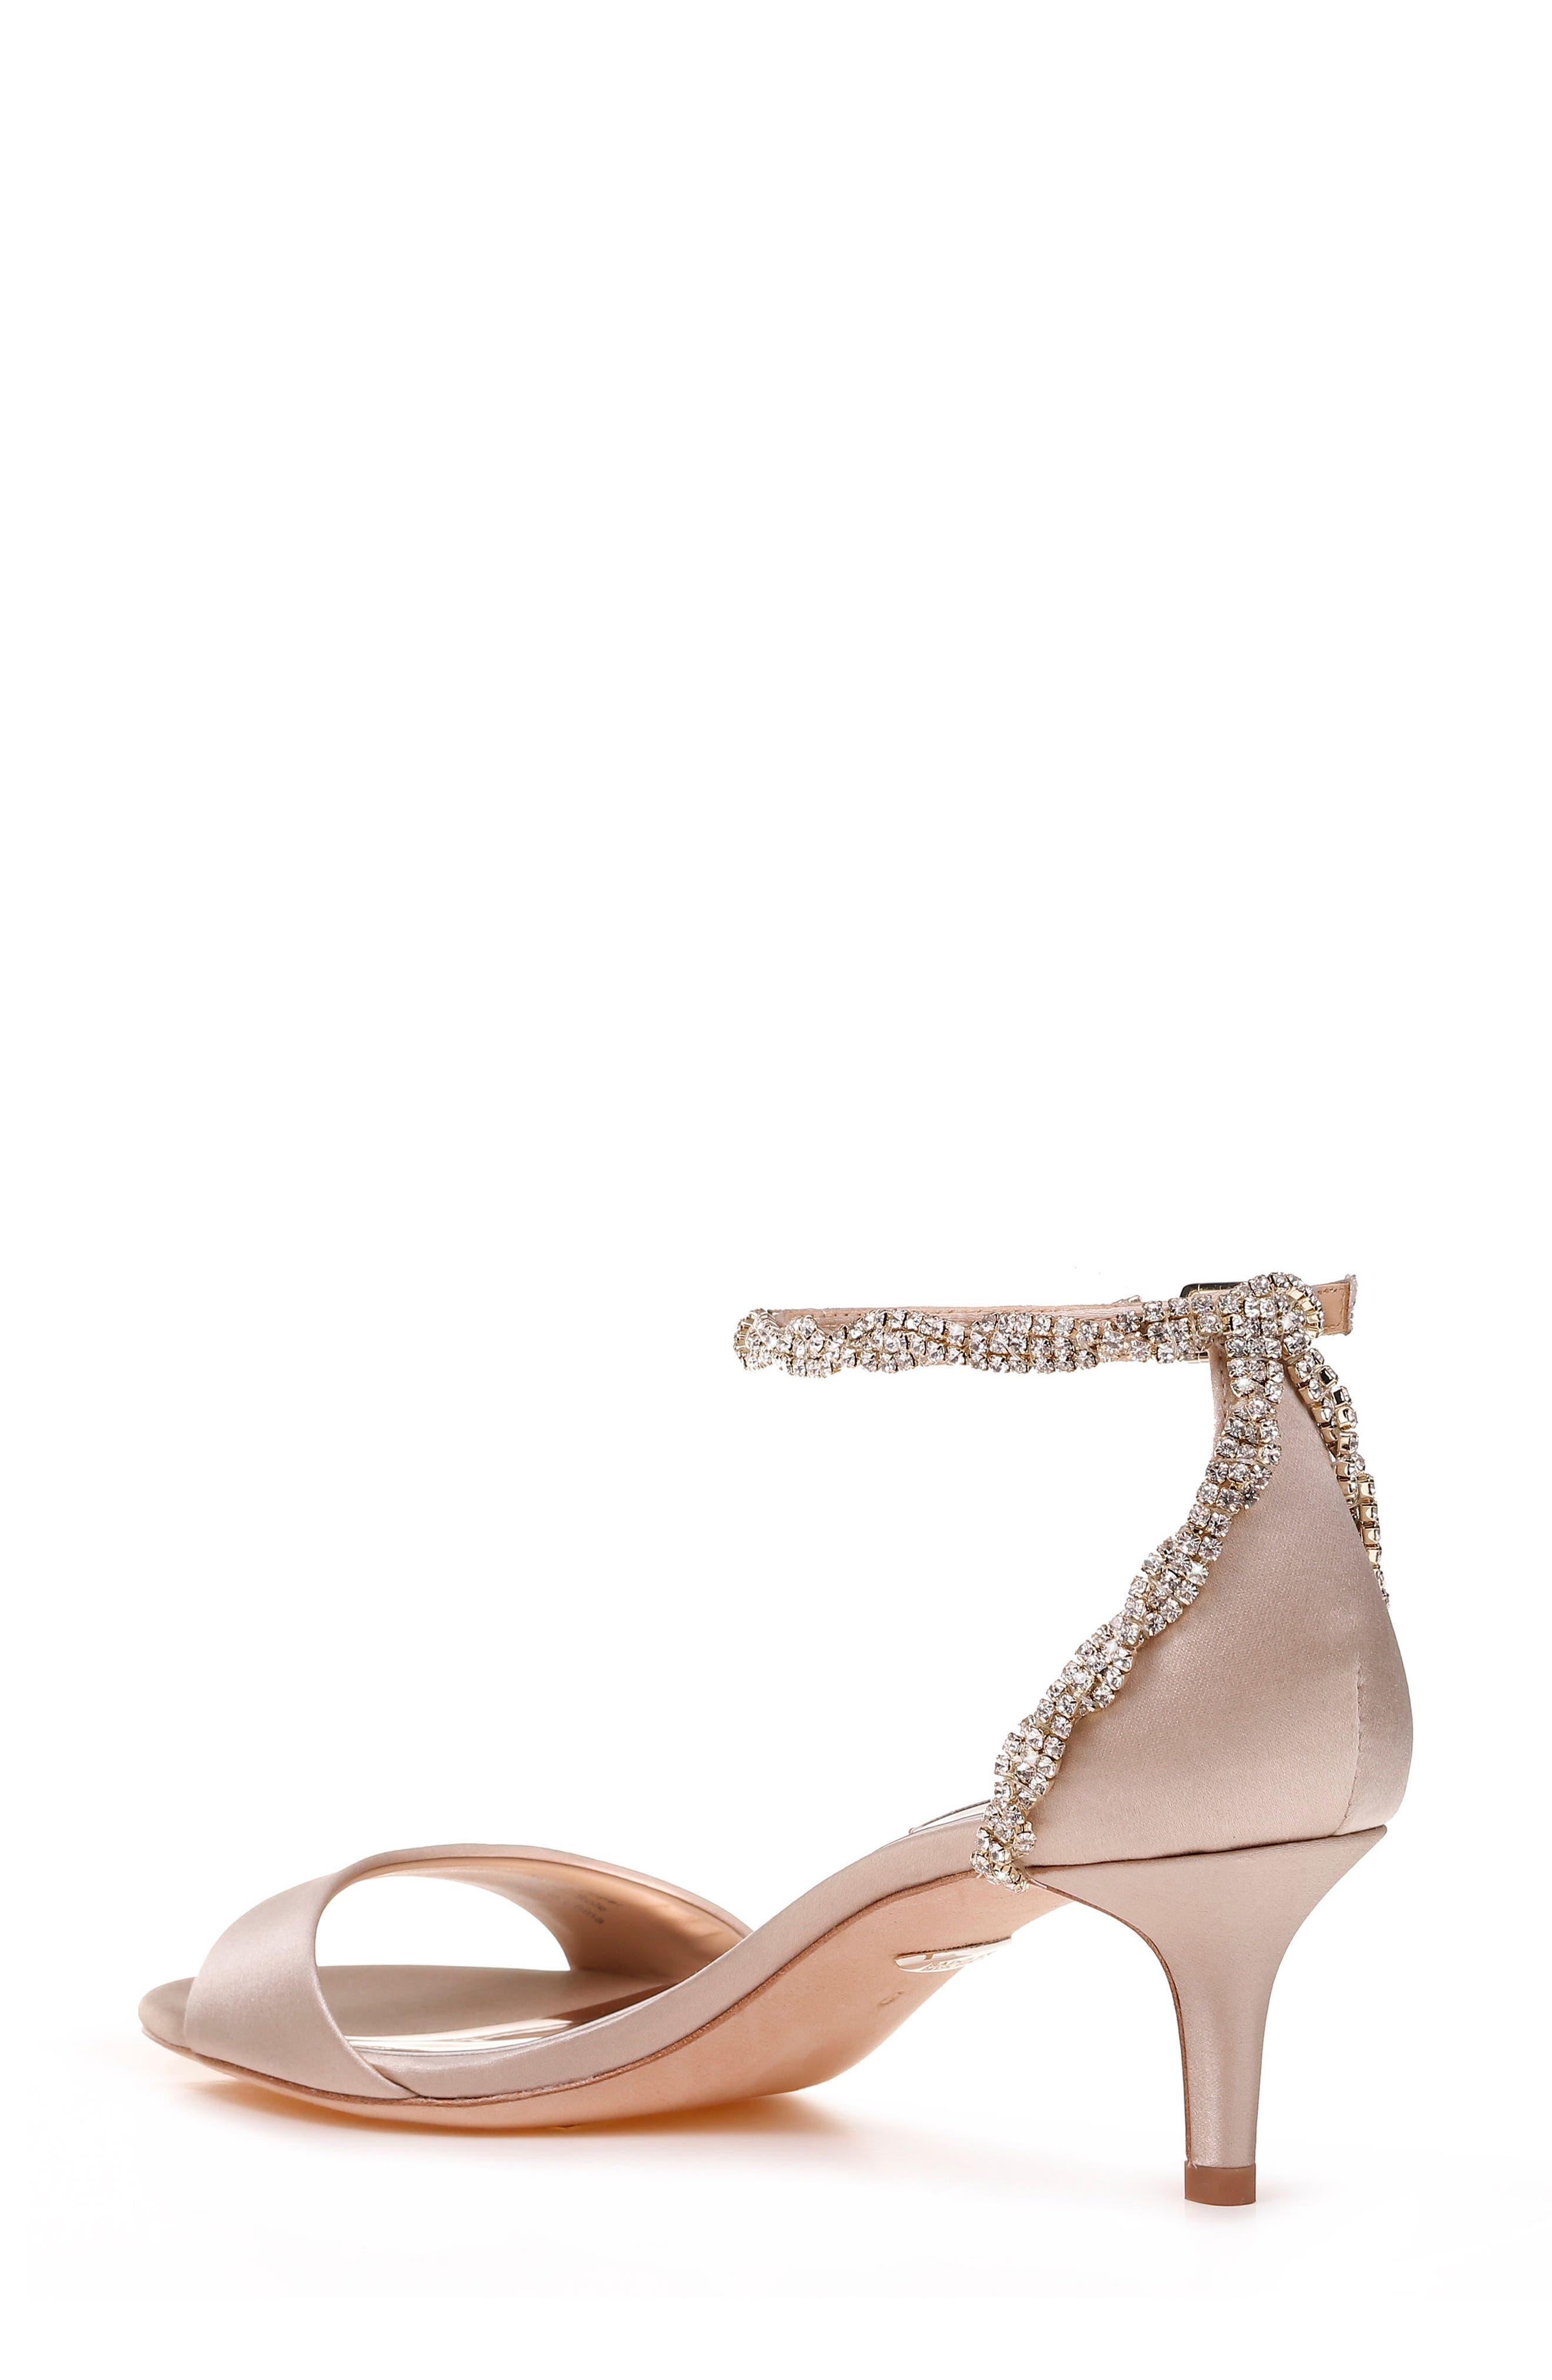 Yareli Crystal Embellished Sandal,                             Alternate thumbnail 2, color,                             NUDE SATIN